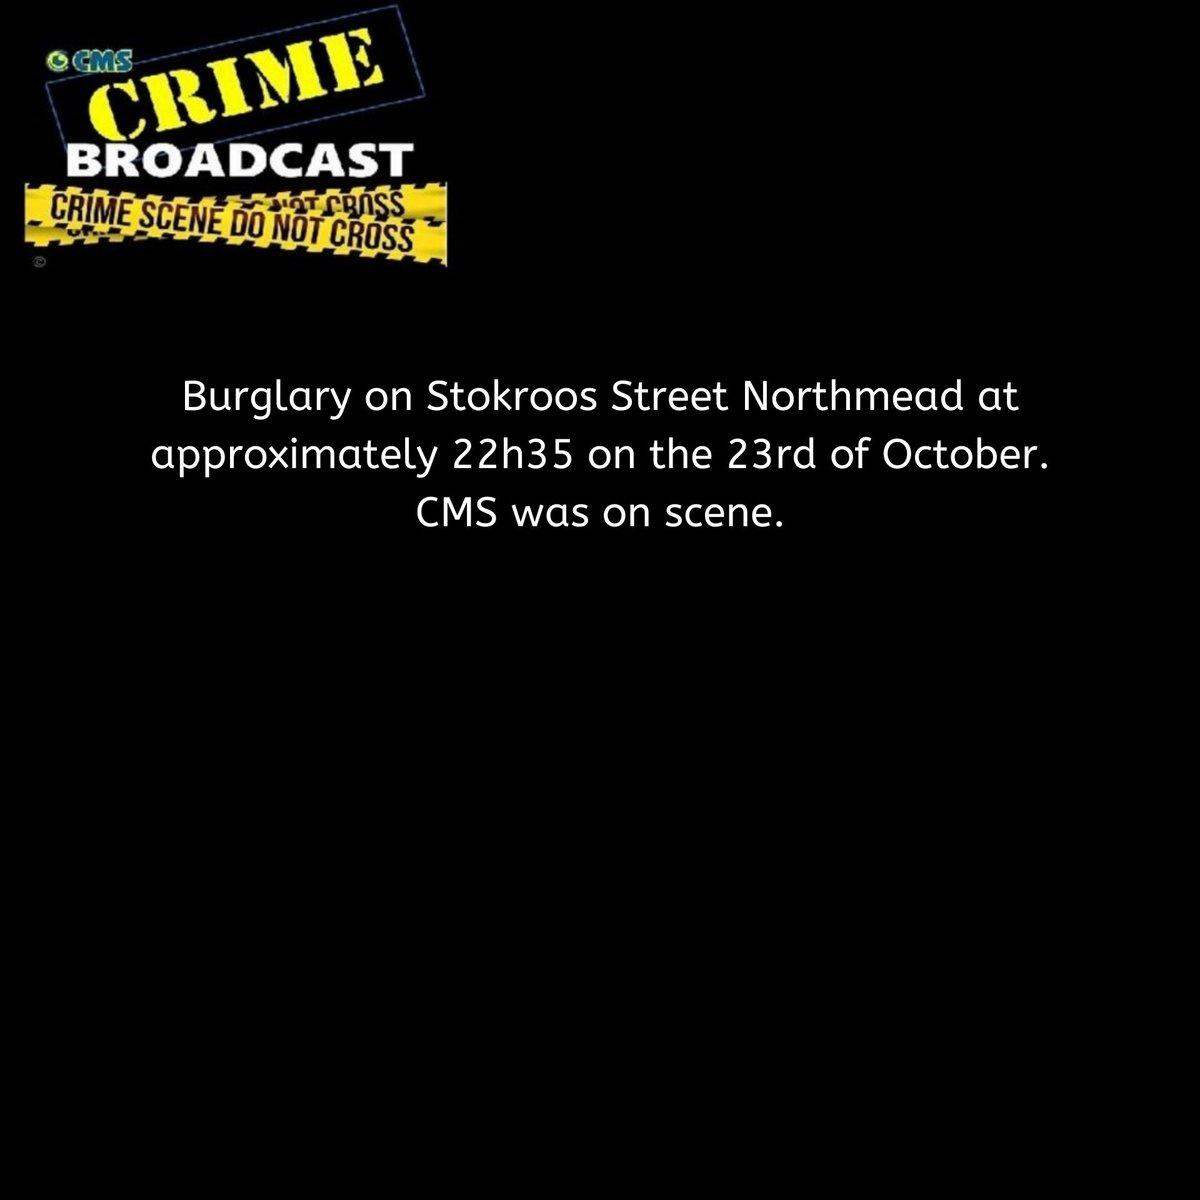 Crimebroadcast 2020-10-24 #CommunityRules #Safety  #proudlycms #Patrolling #Precincts #Ekurhuleni #Reaction #Closures #CommunityMonitoringServices https://t.co/00TC1dUpJ9